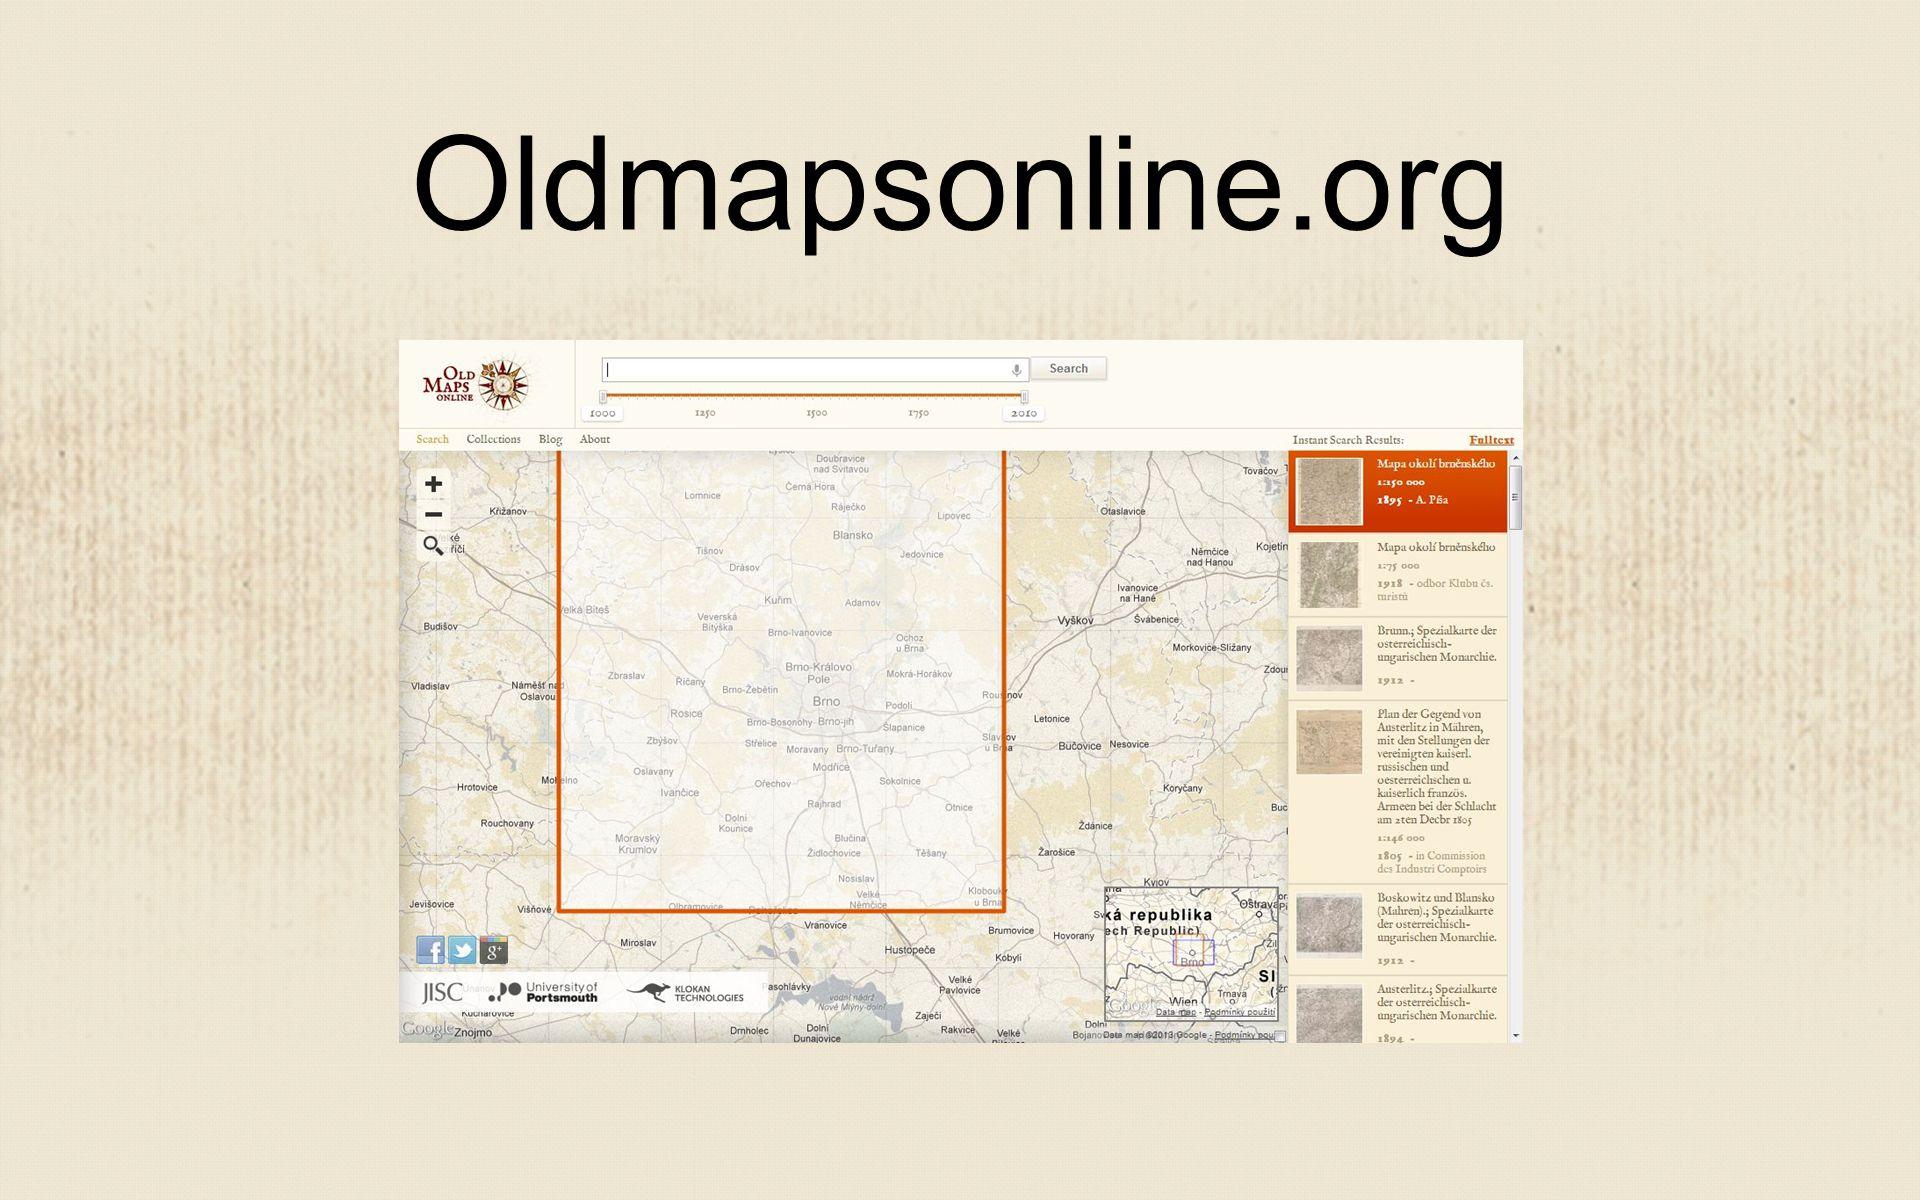 Oldmapsonline.org